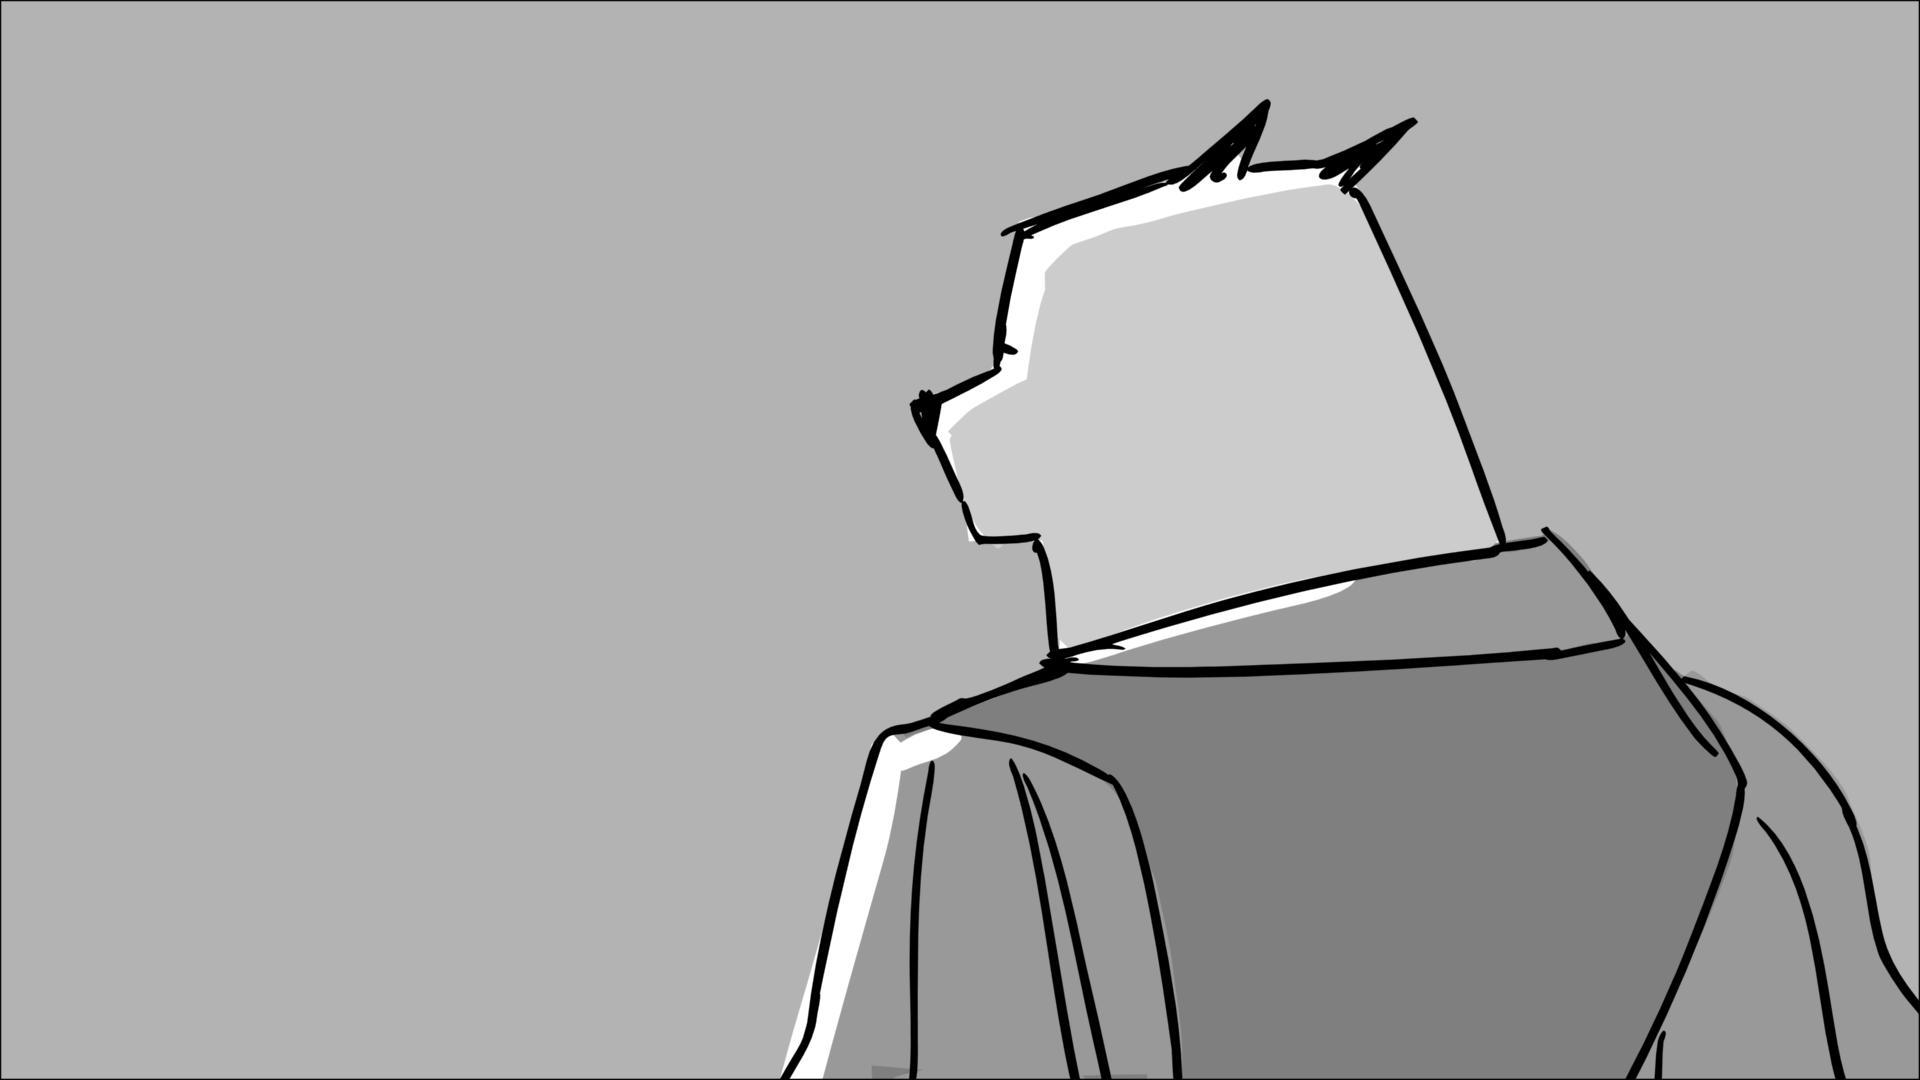 Blades of Furry-000032-01.jpg